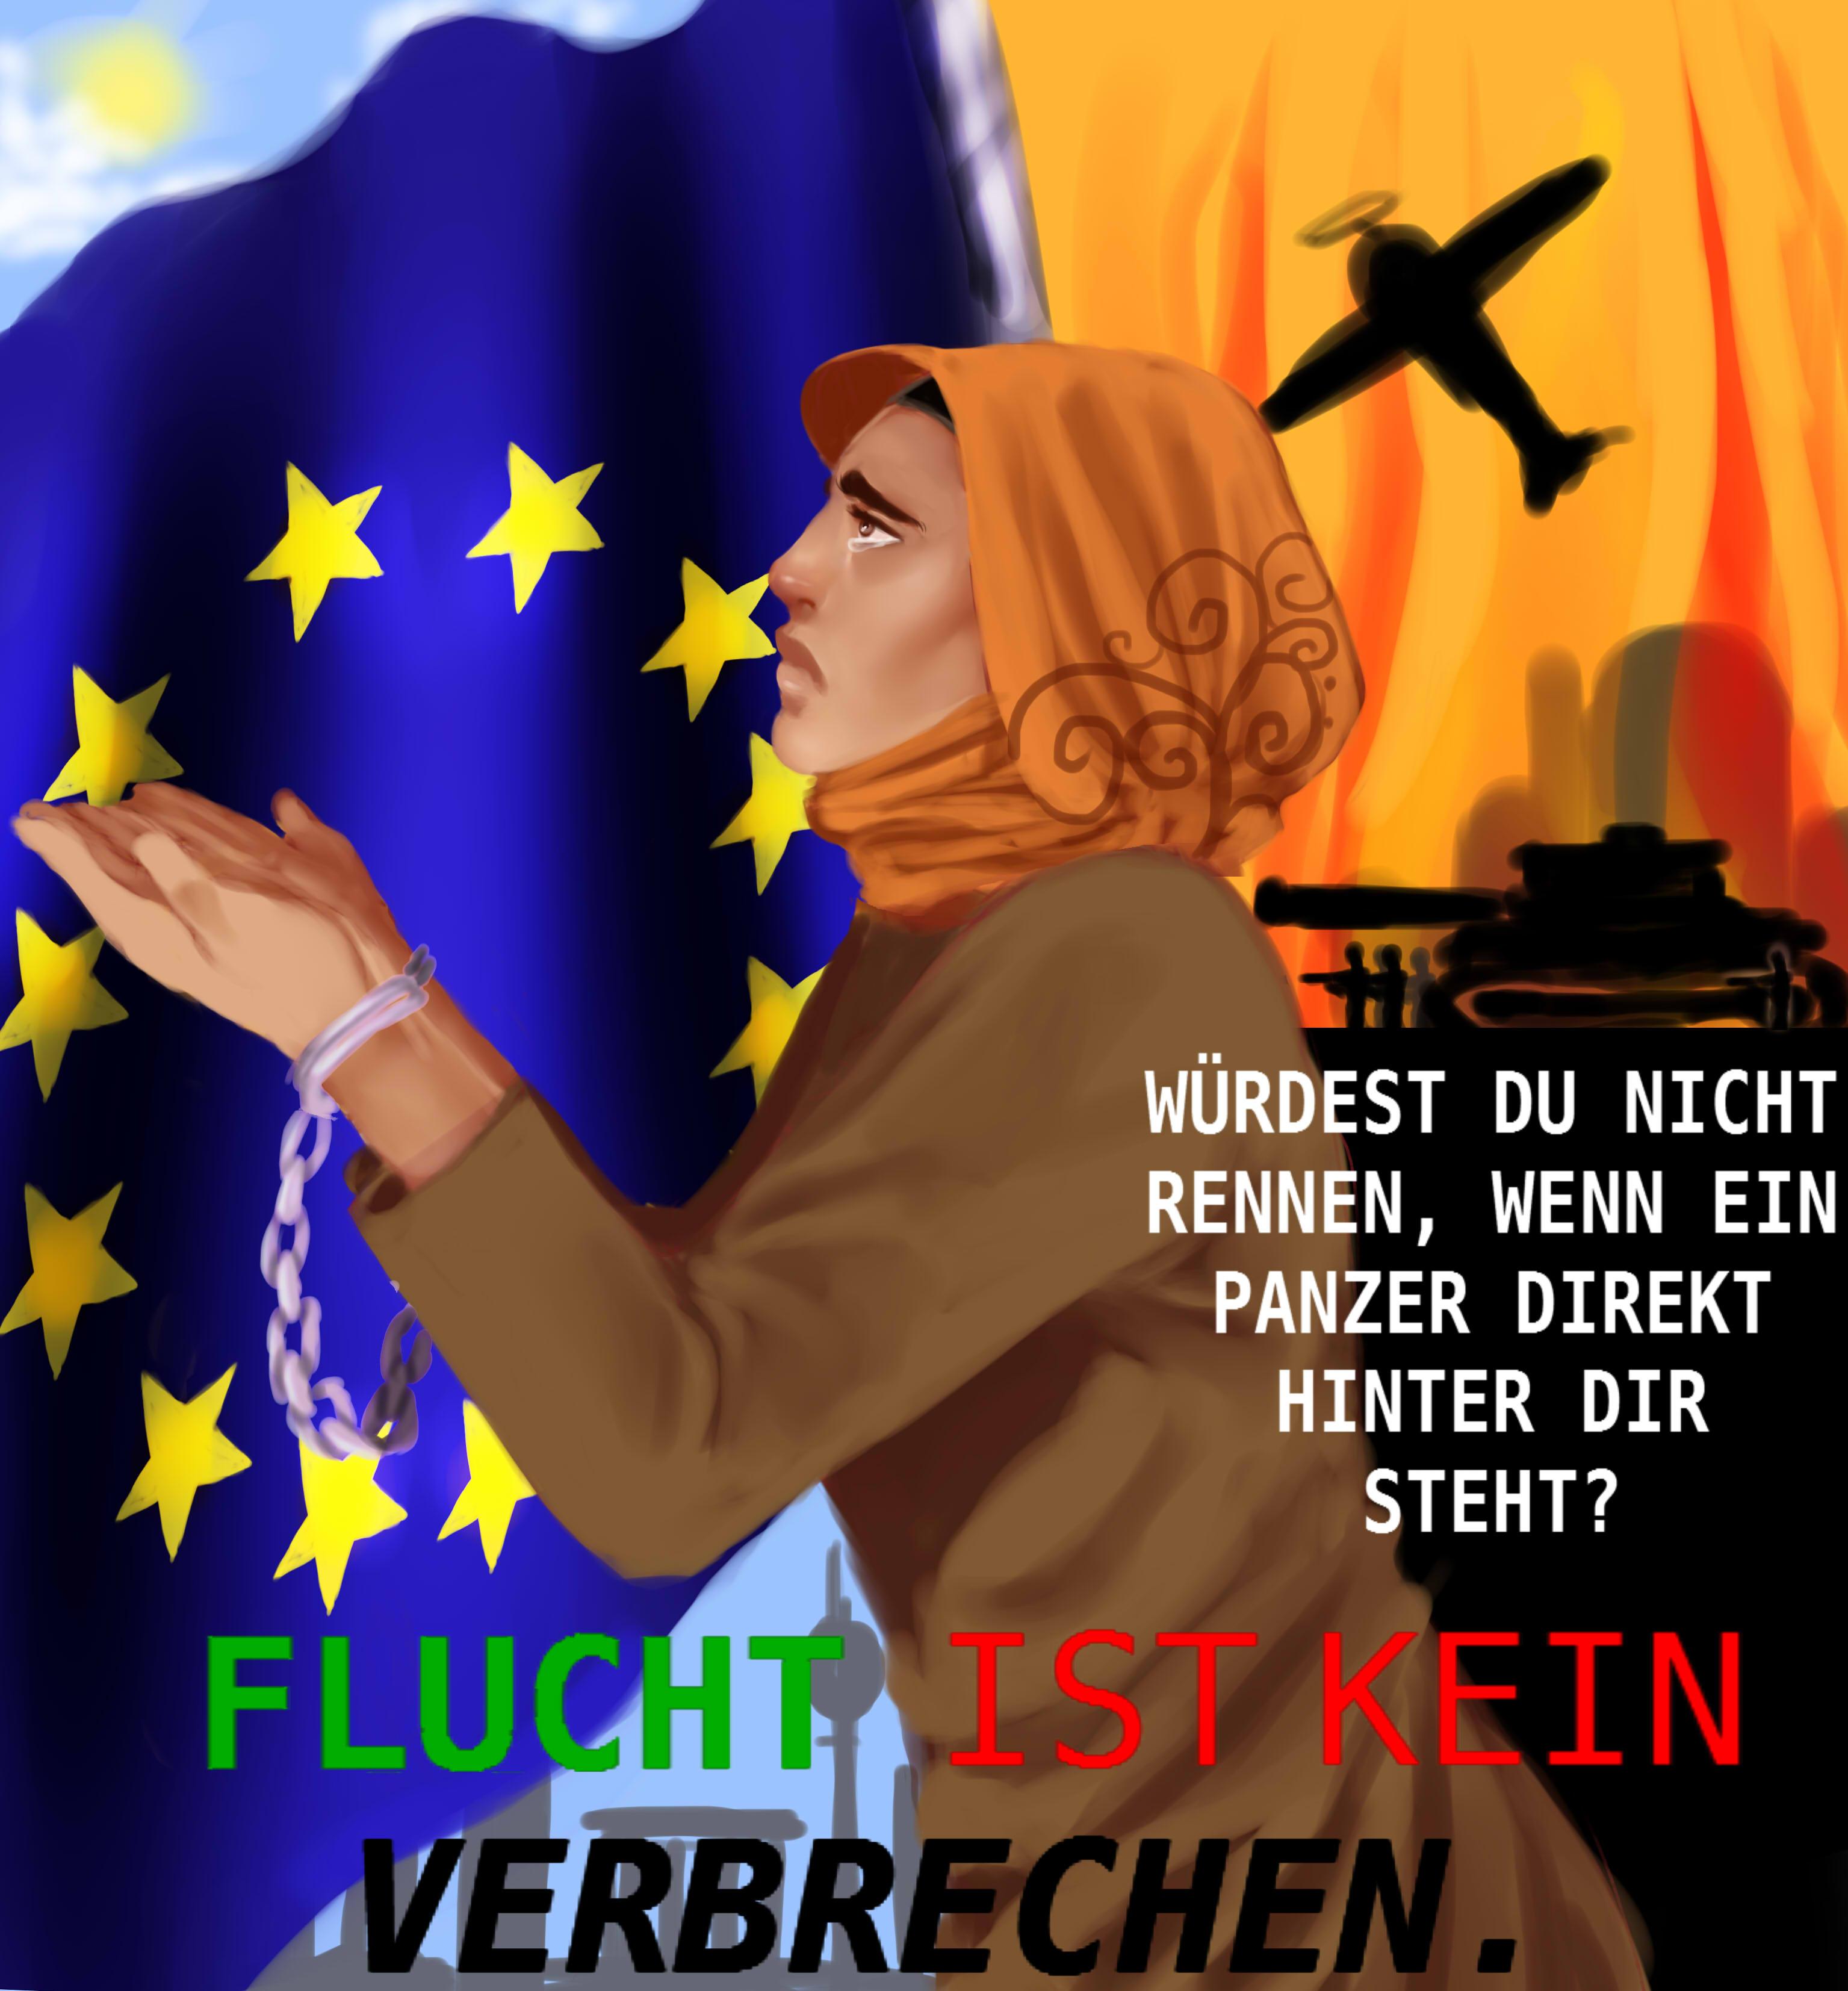 Jenny Okafor, Flucht-ist-kein-Verbrechen